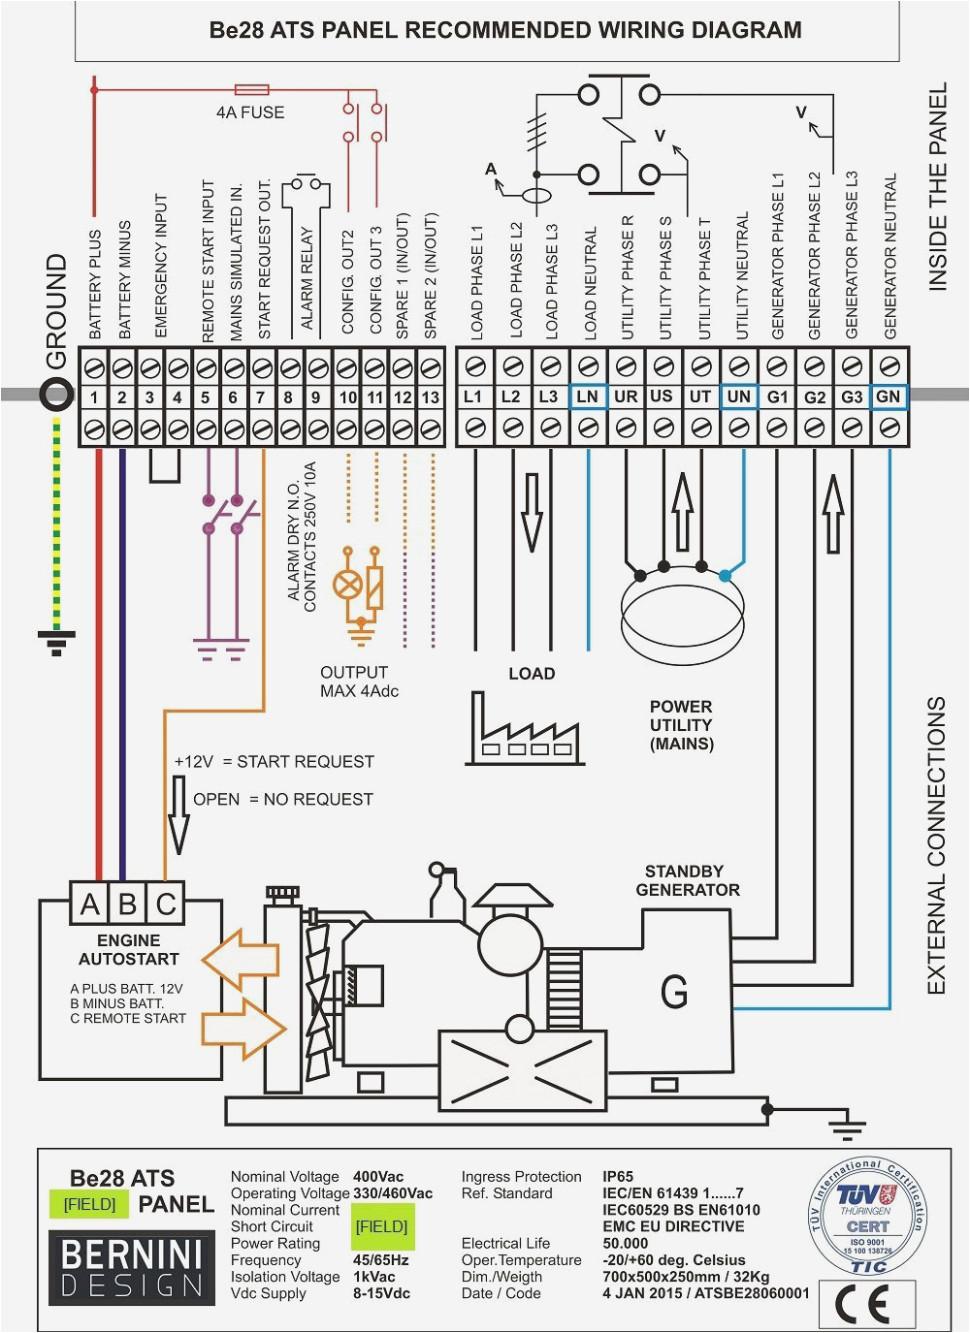 wiring diagram of ats panel for generator wiring diagram librariesgenerac ats wiring simple wiring diagramgenerac wiring